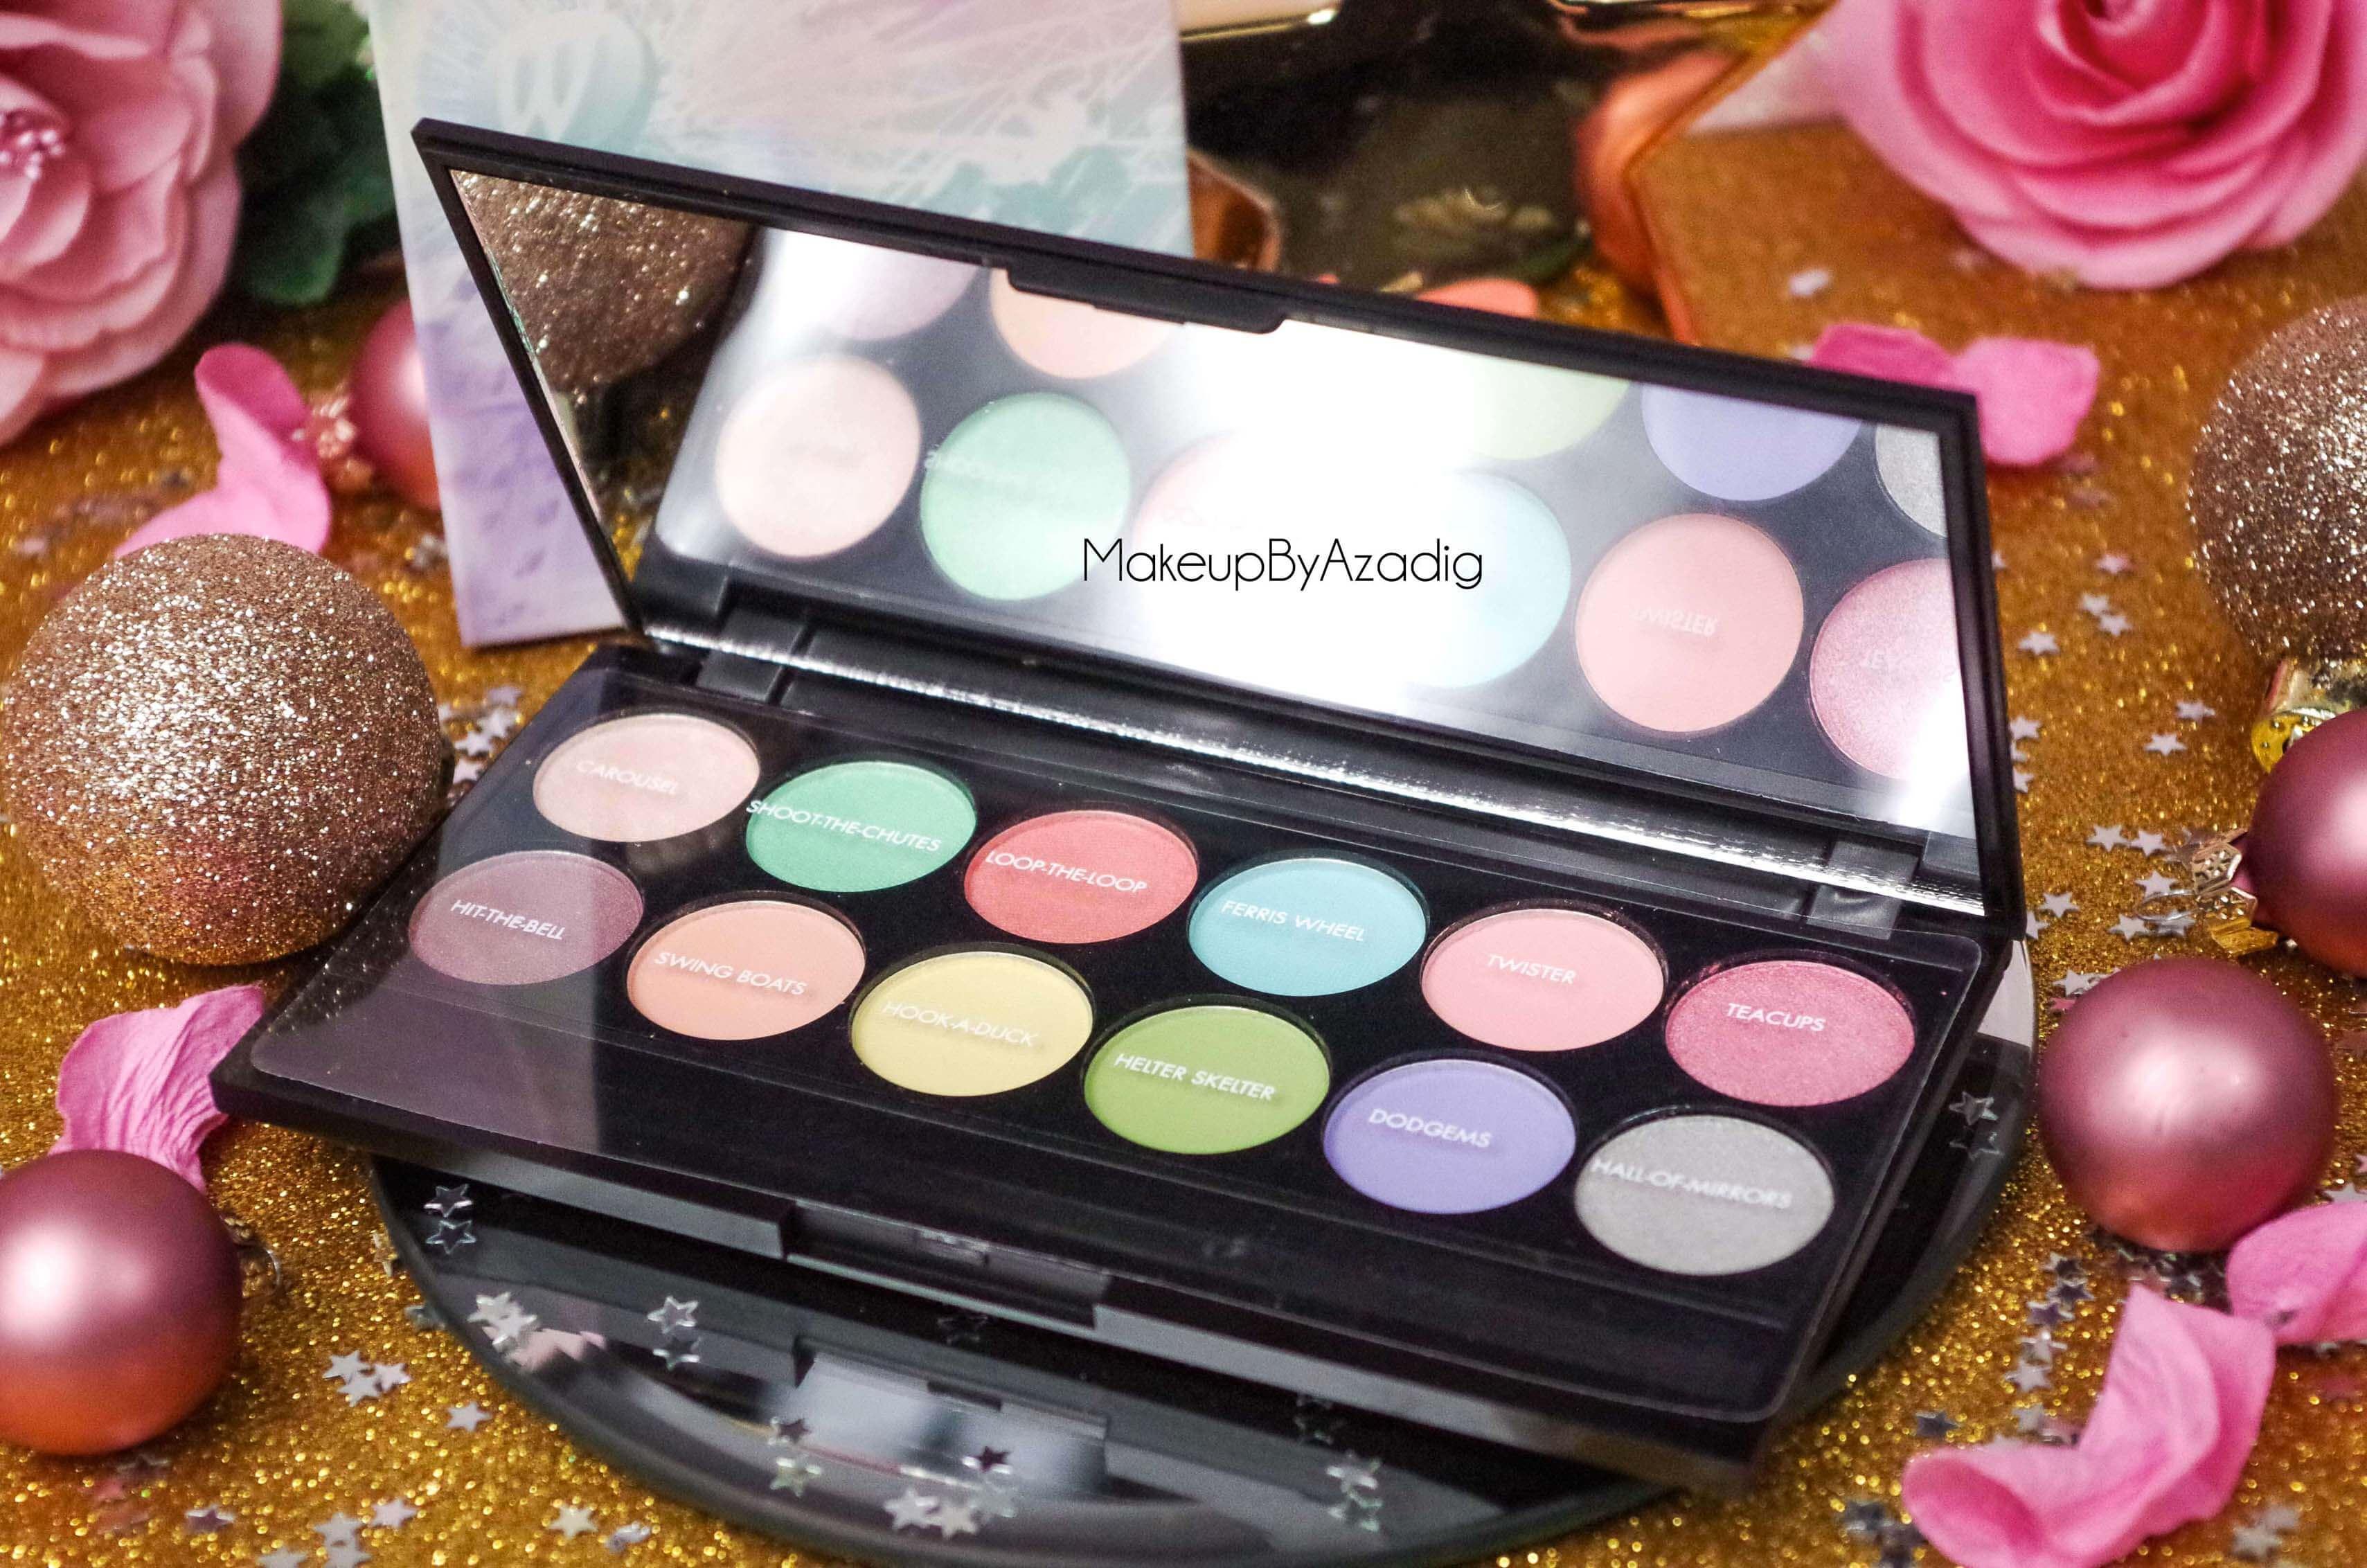 review-palette-sleek-makeup-idivine-pas-cher-sephora-couleurs-allthefunofthefair-code-promo-sephora-paris-makeupbyazadig-teintes-2